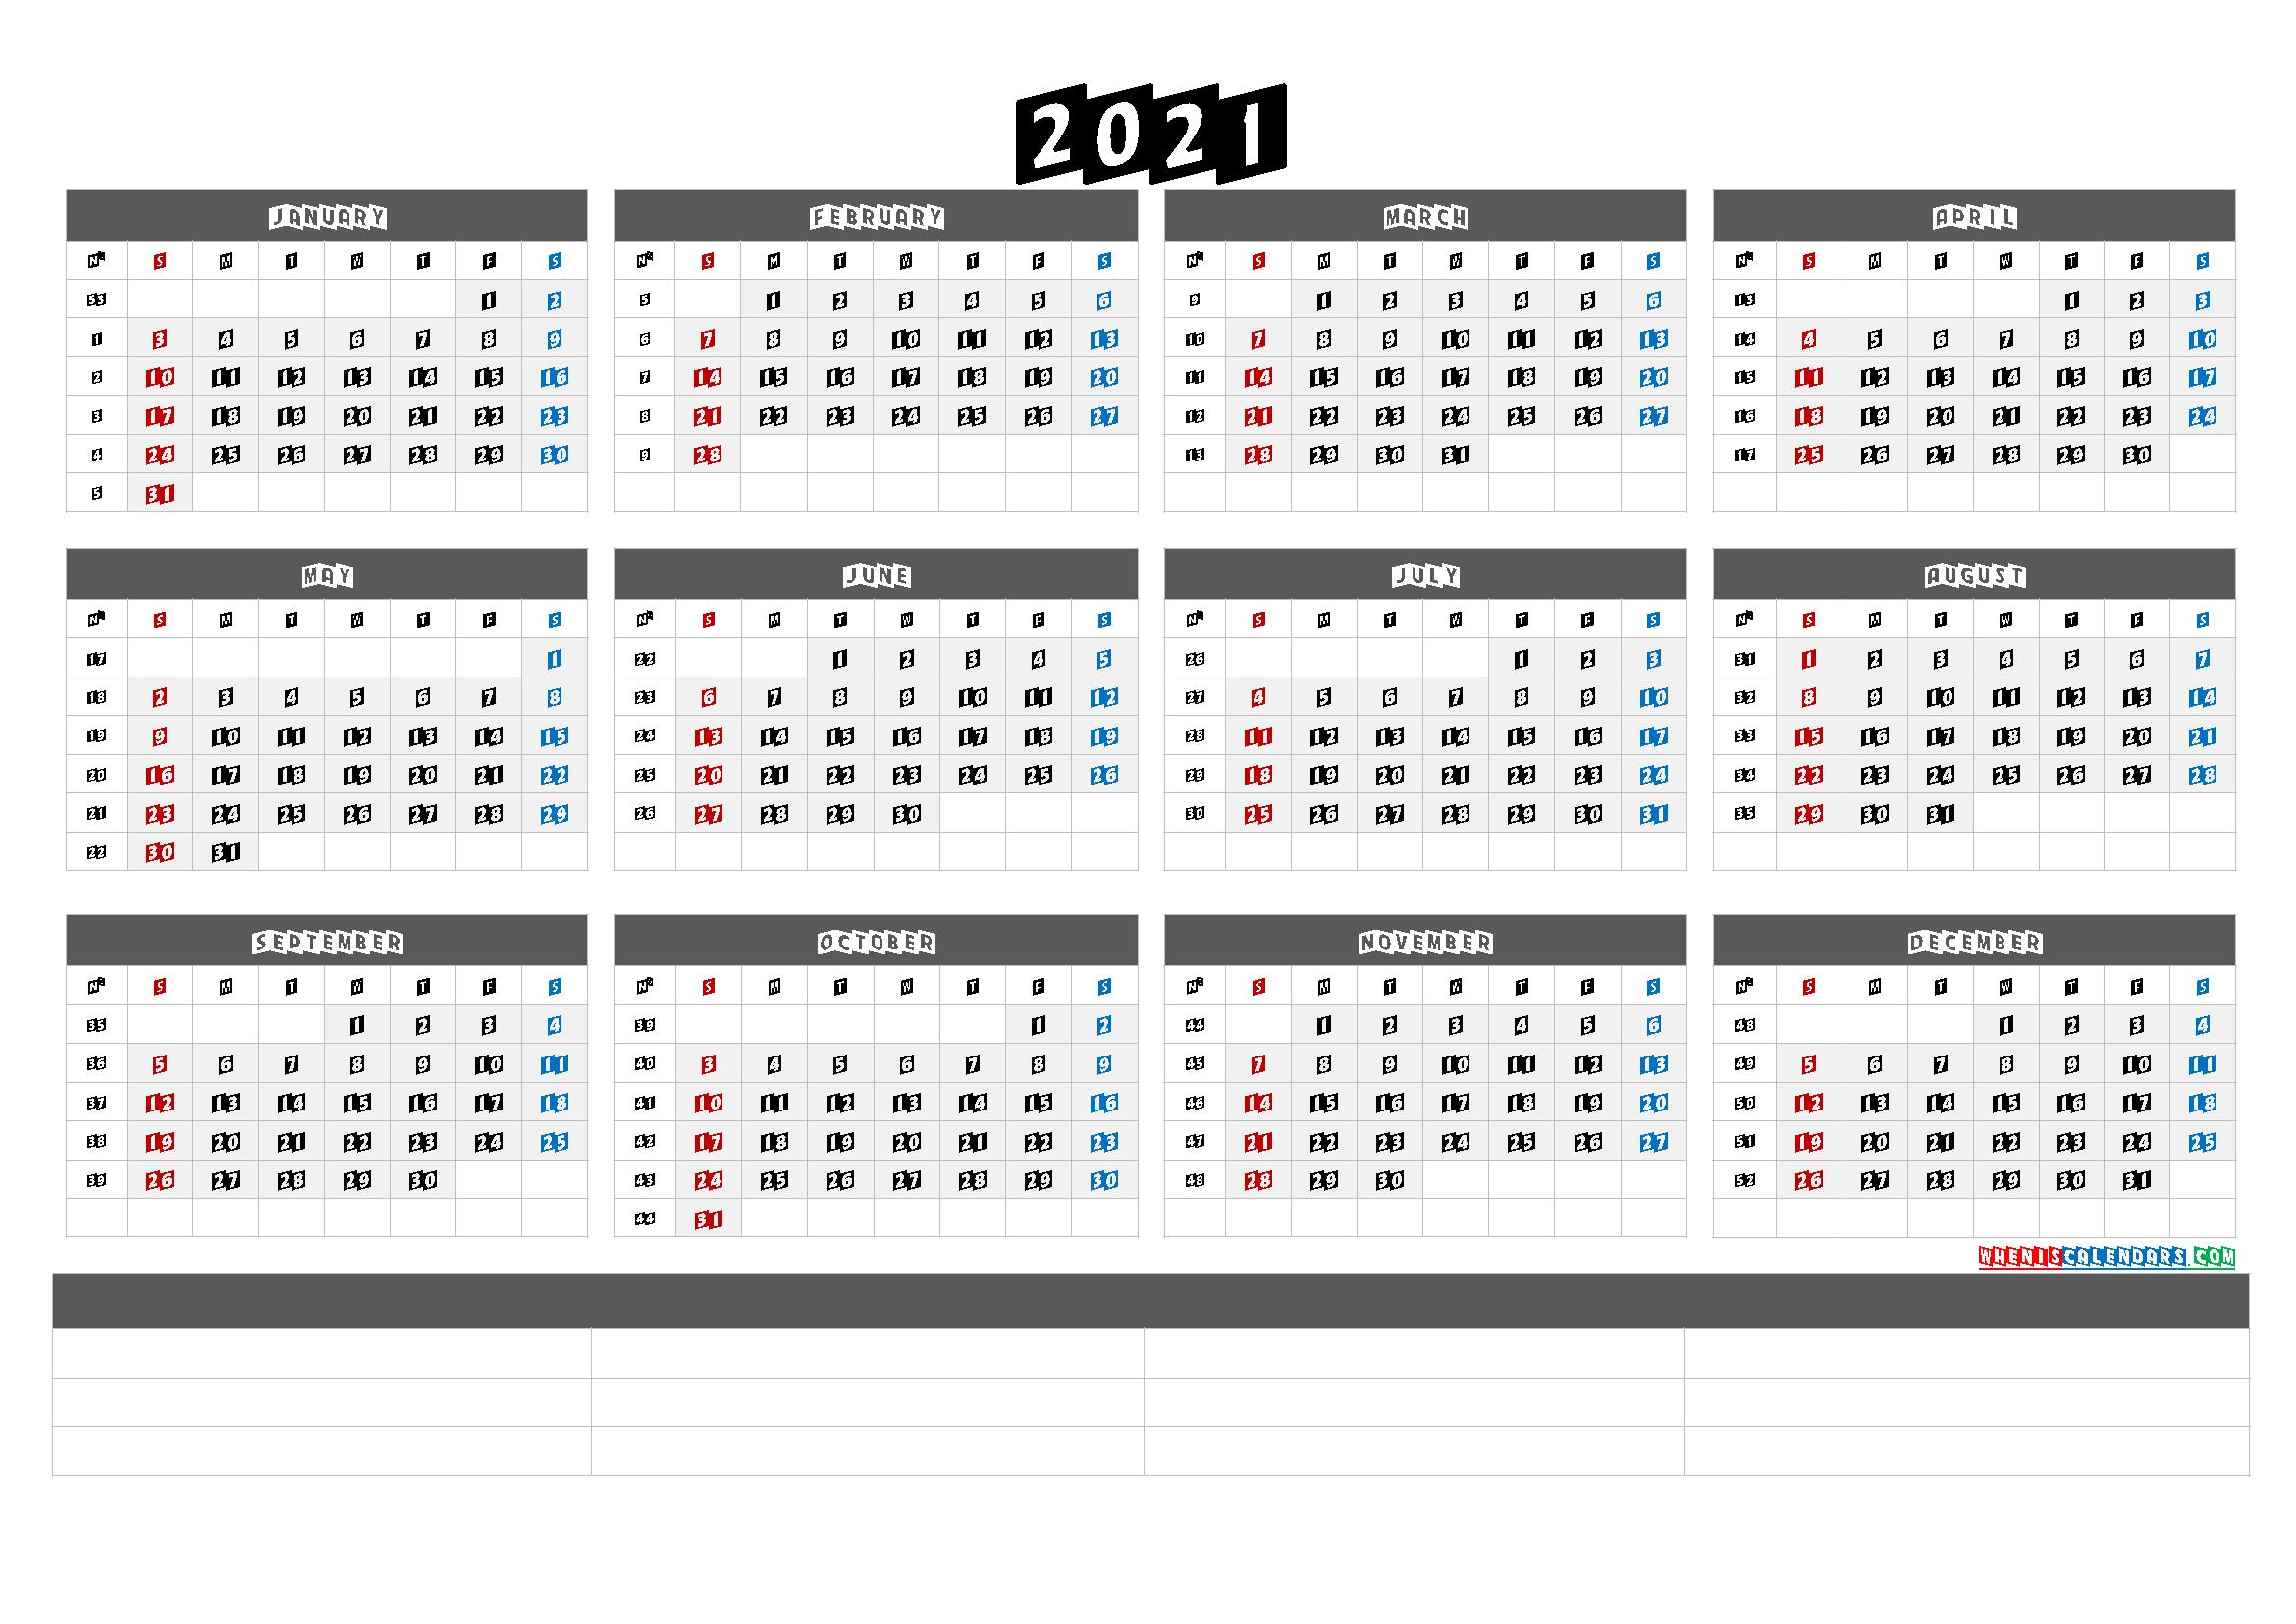 Printable 2021 Yearly Calendar With Week Numbers - Calendraex